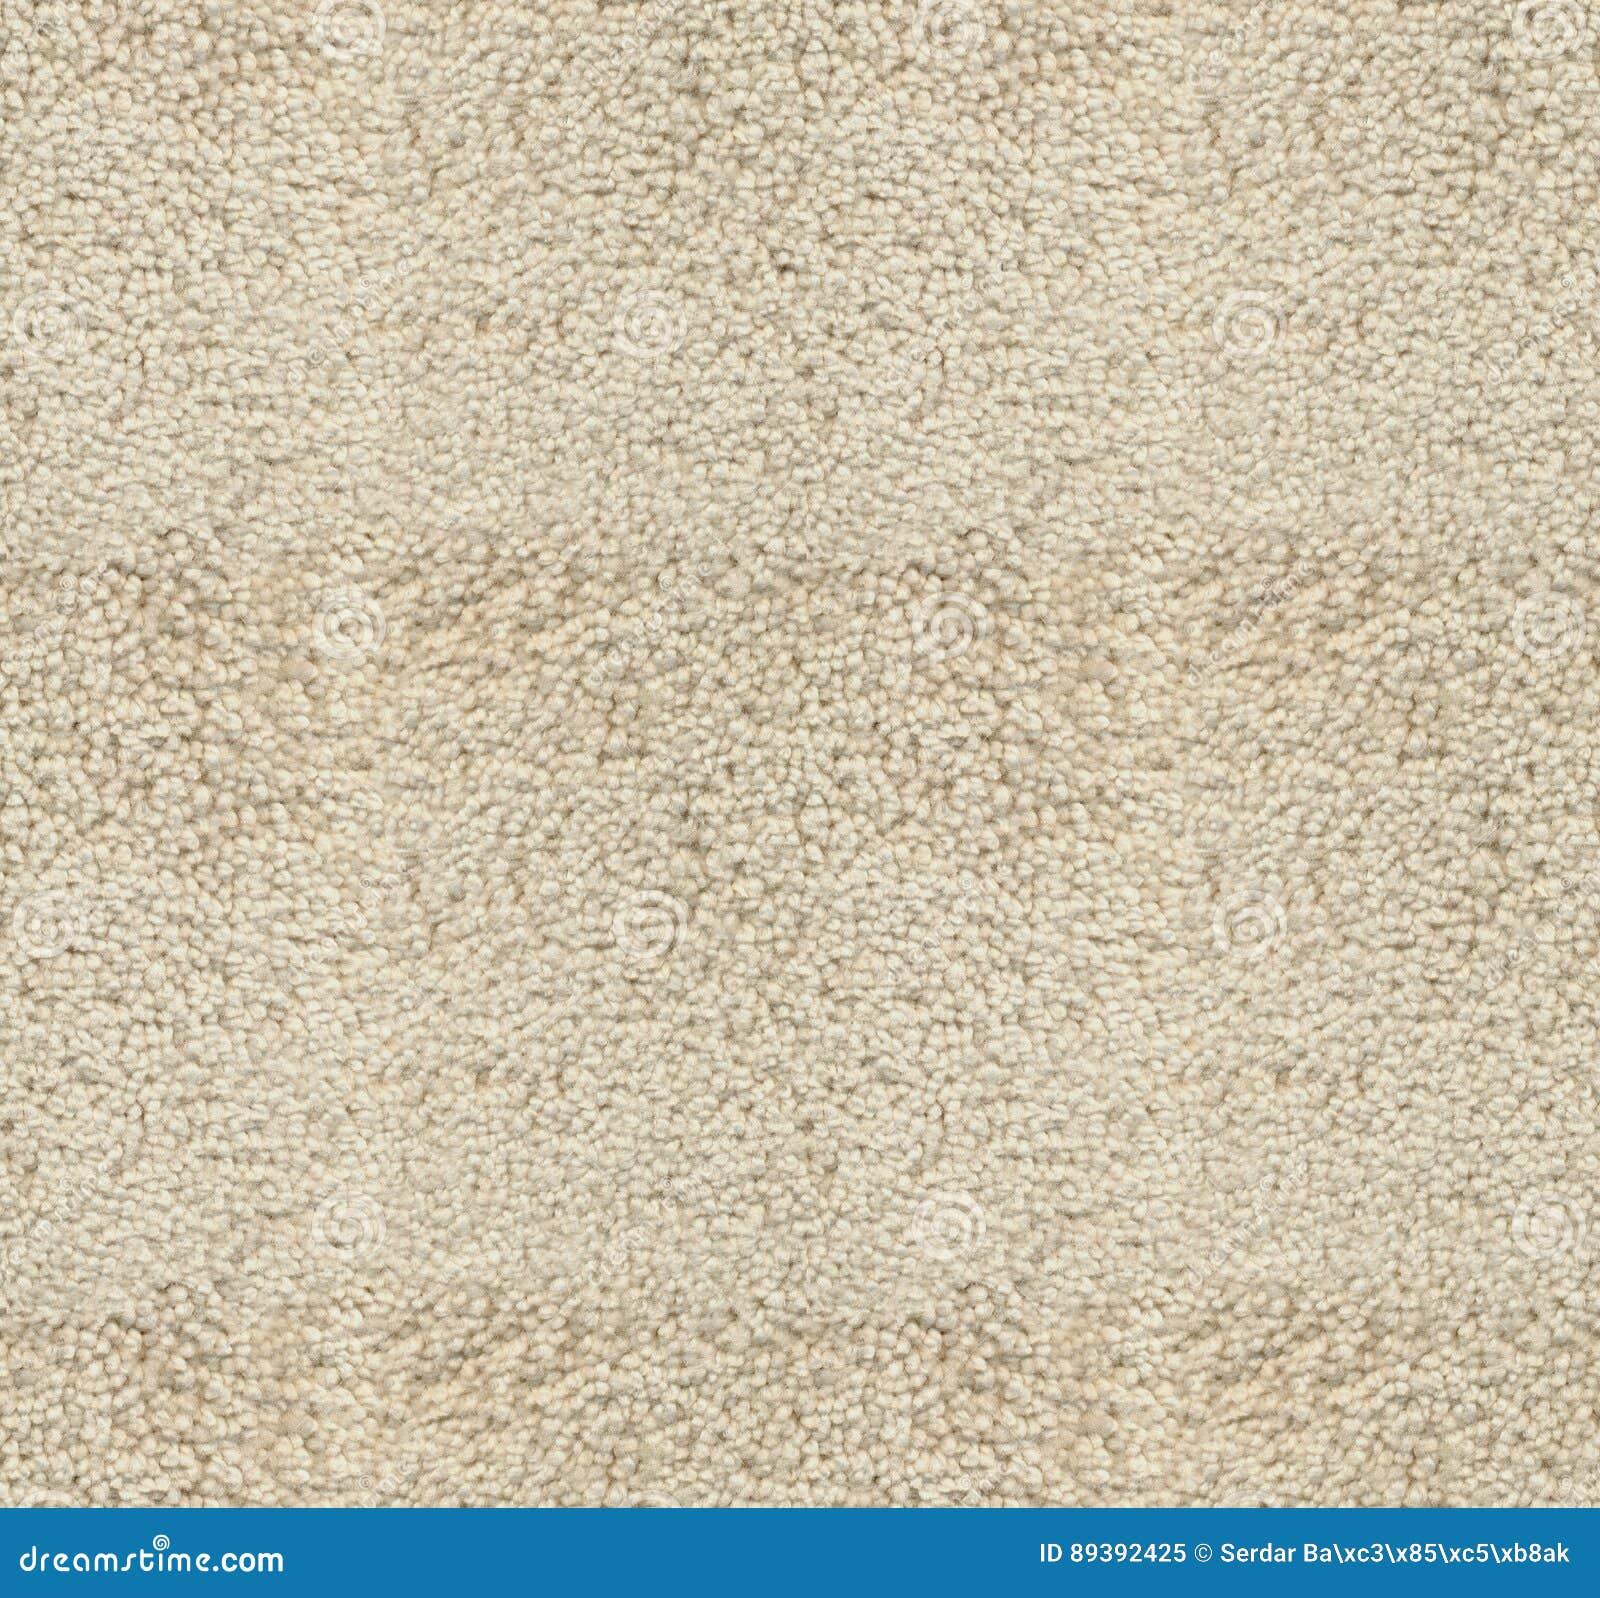 Beige carpet texture Soft Background Of Carpet Material Pattern Texture Flooring Dreamstimecom Beige Carpet Texture Stock Image Image Of Abstract Industrial